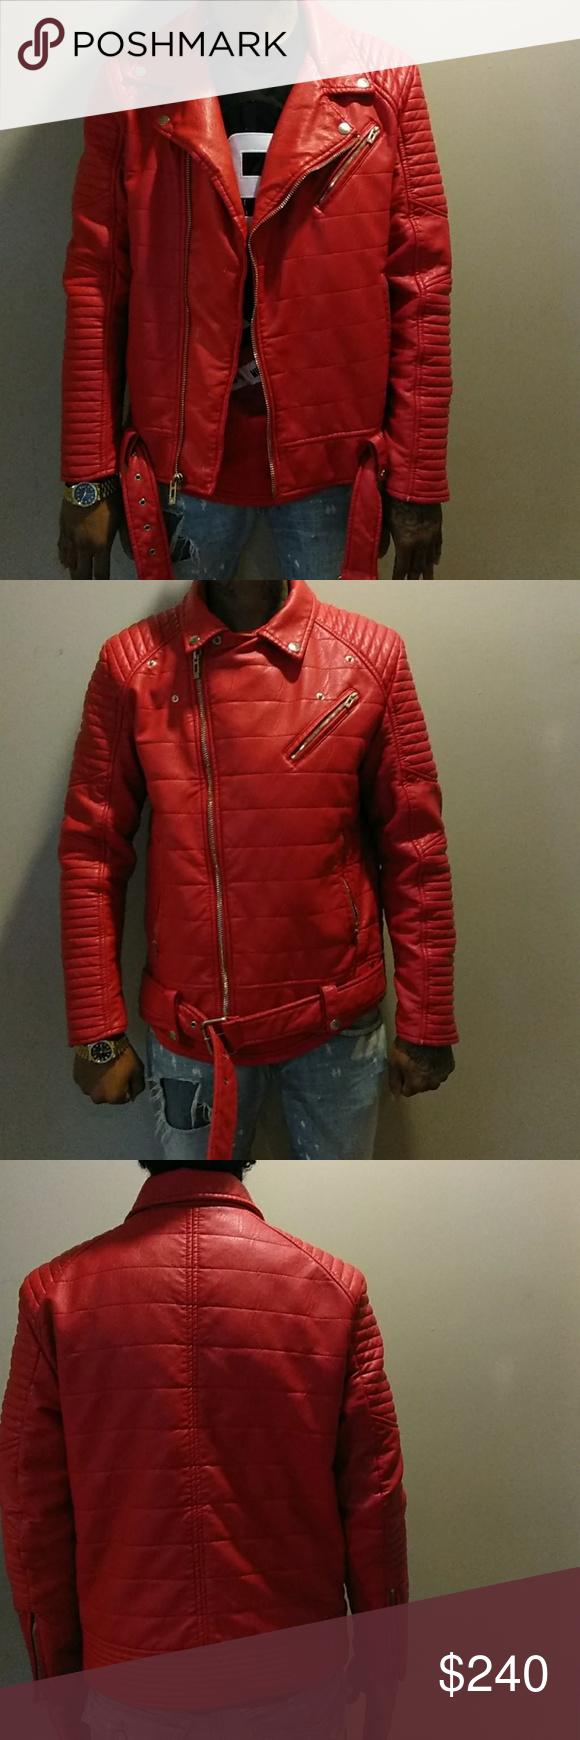 1b96783baeaca2 Zipper red biker jacket Red zipper jordan craig Jackets   Coats Bomber    Varsity